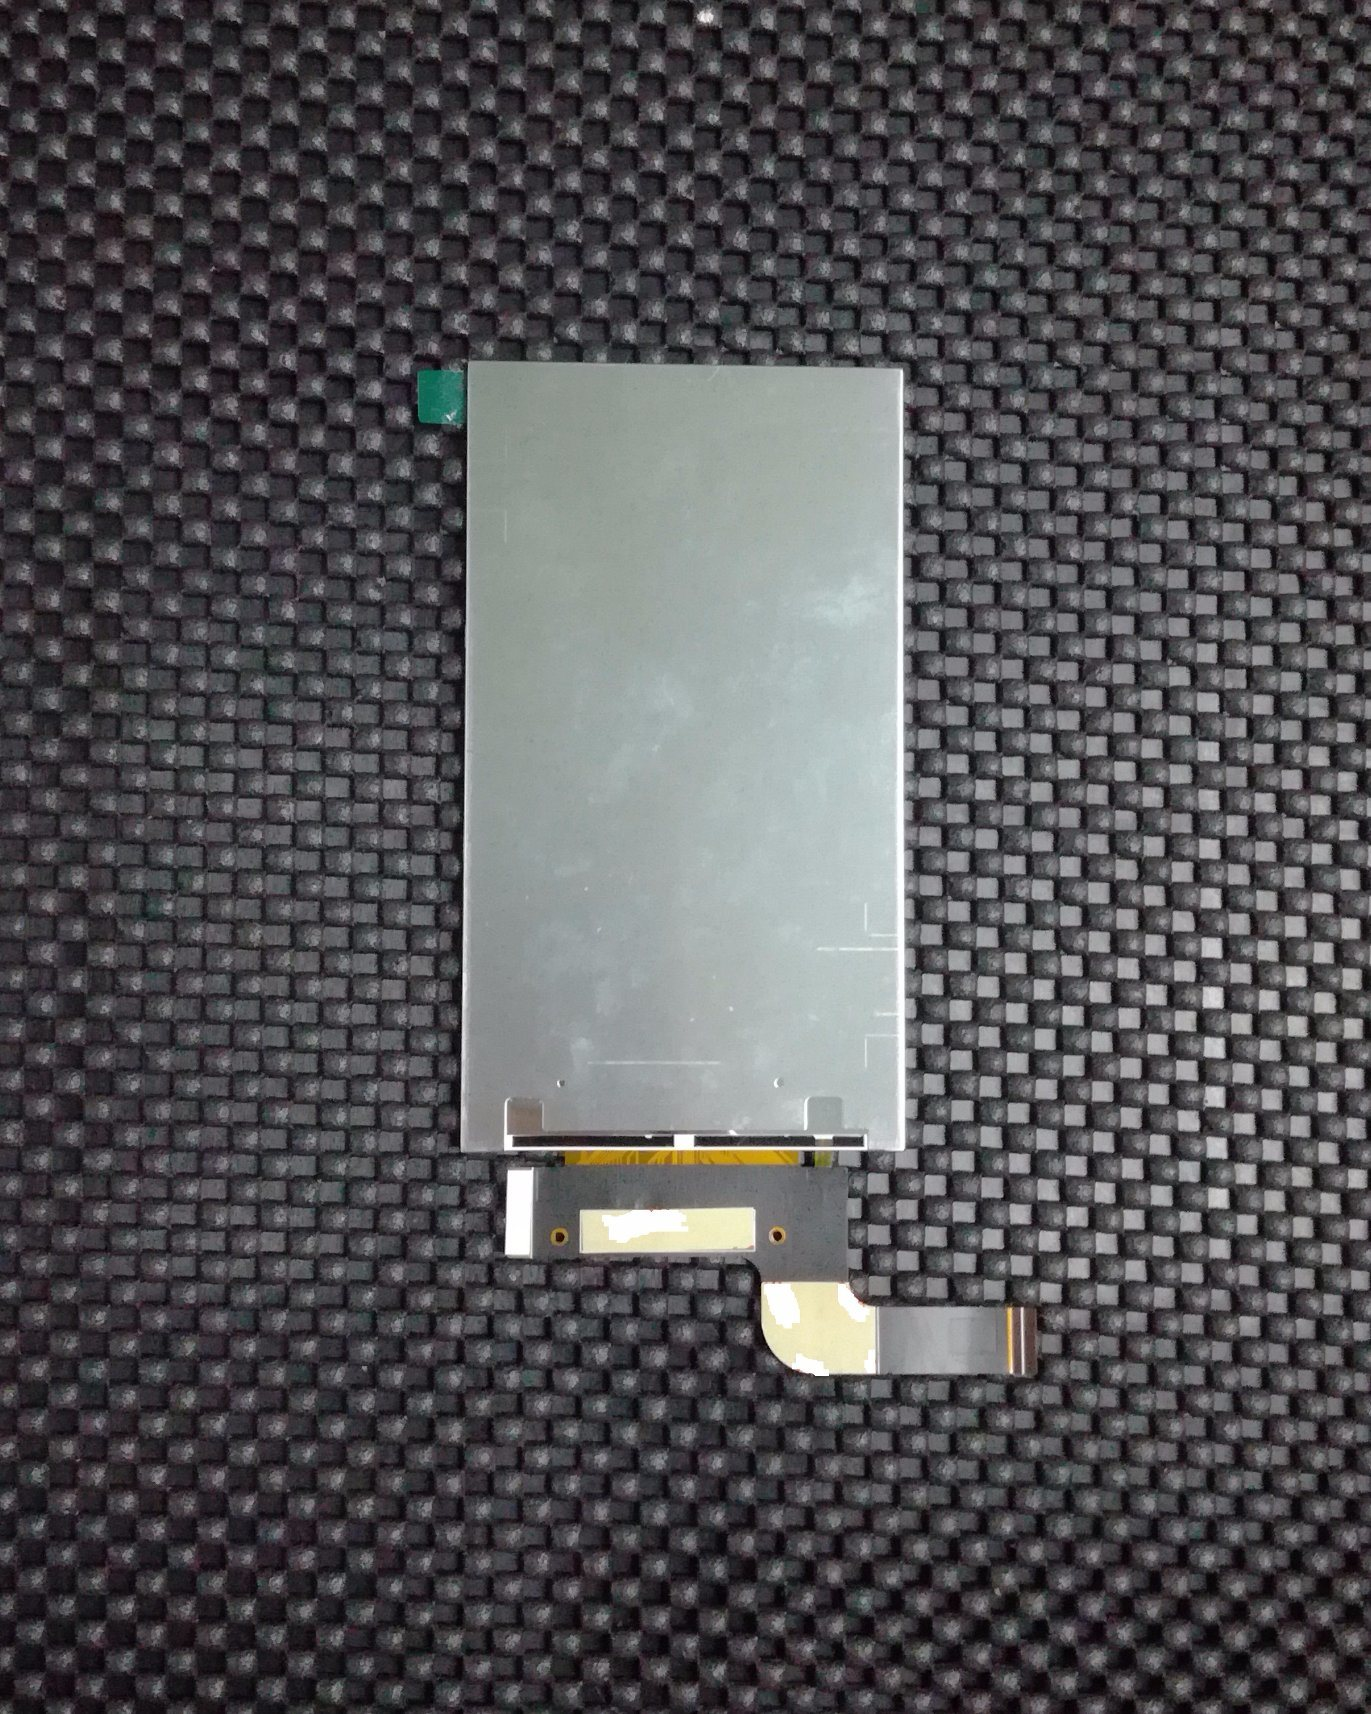 5 Inch 540*960 Resolution Customizable TFT LCD Module LCD Display B012